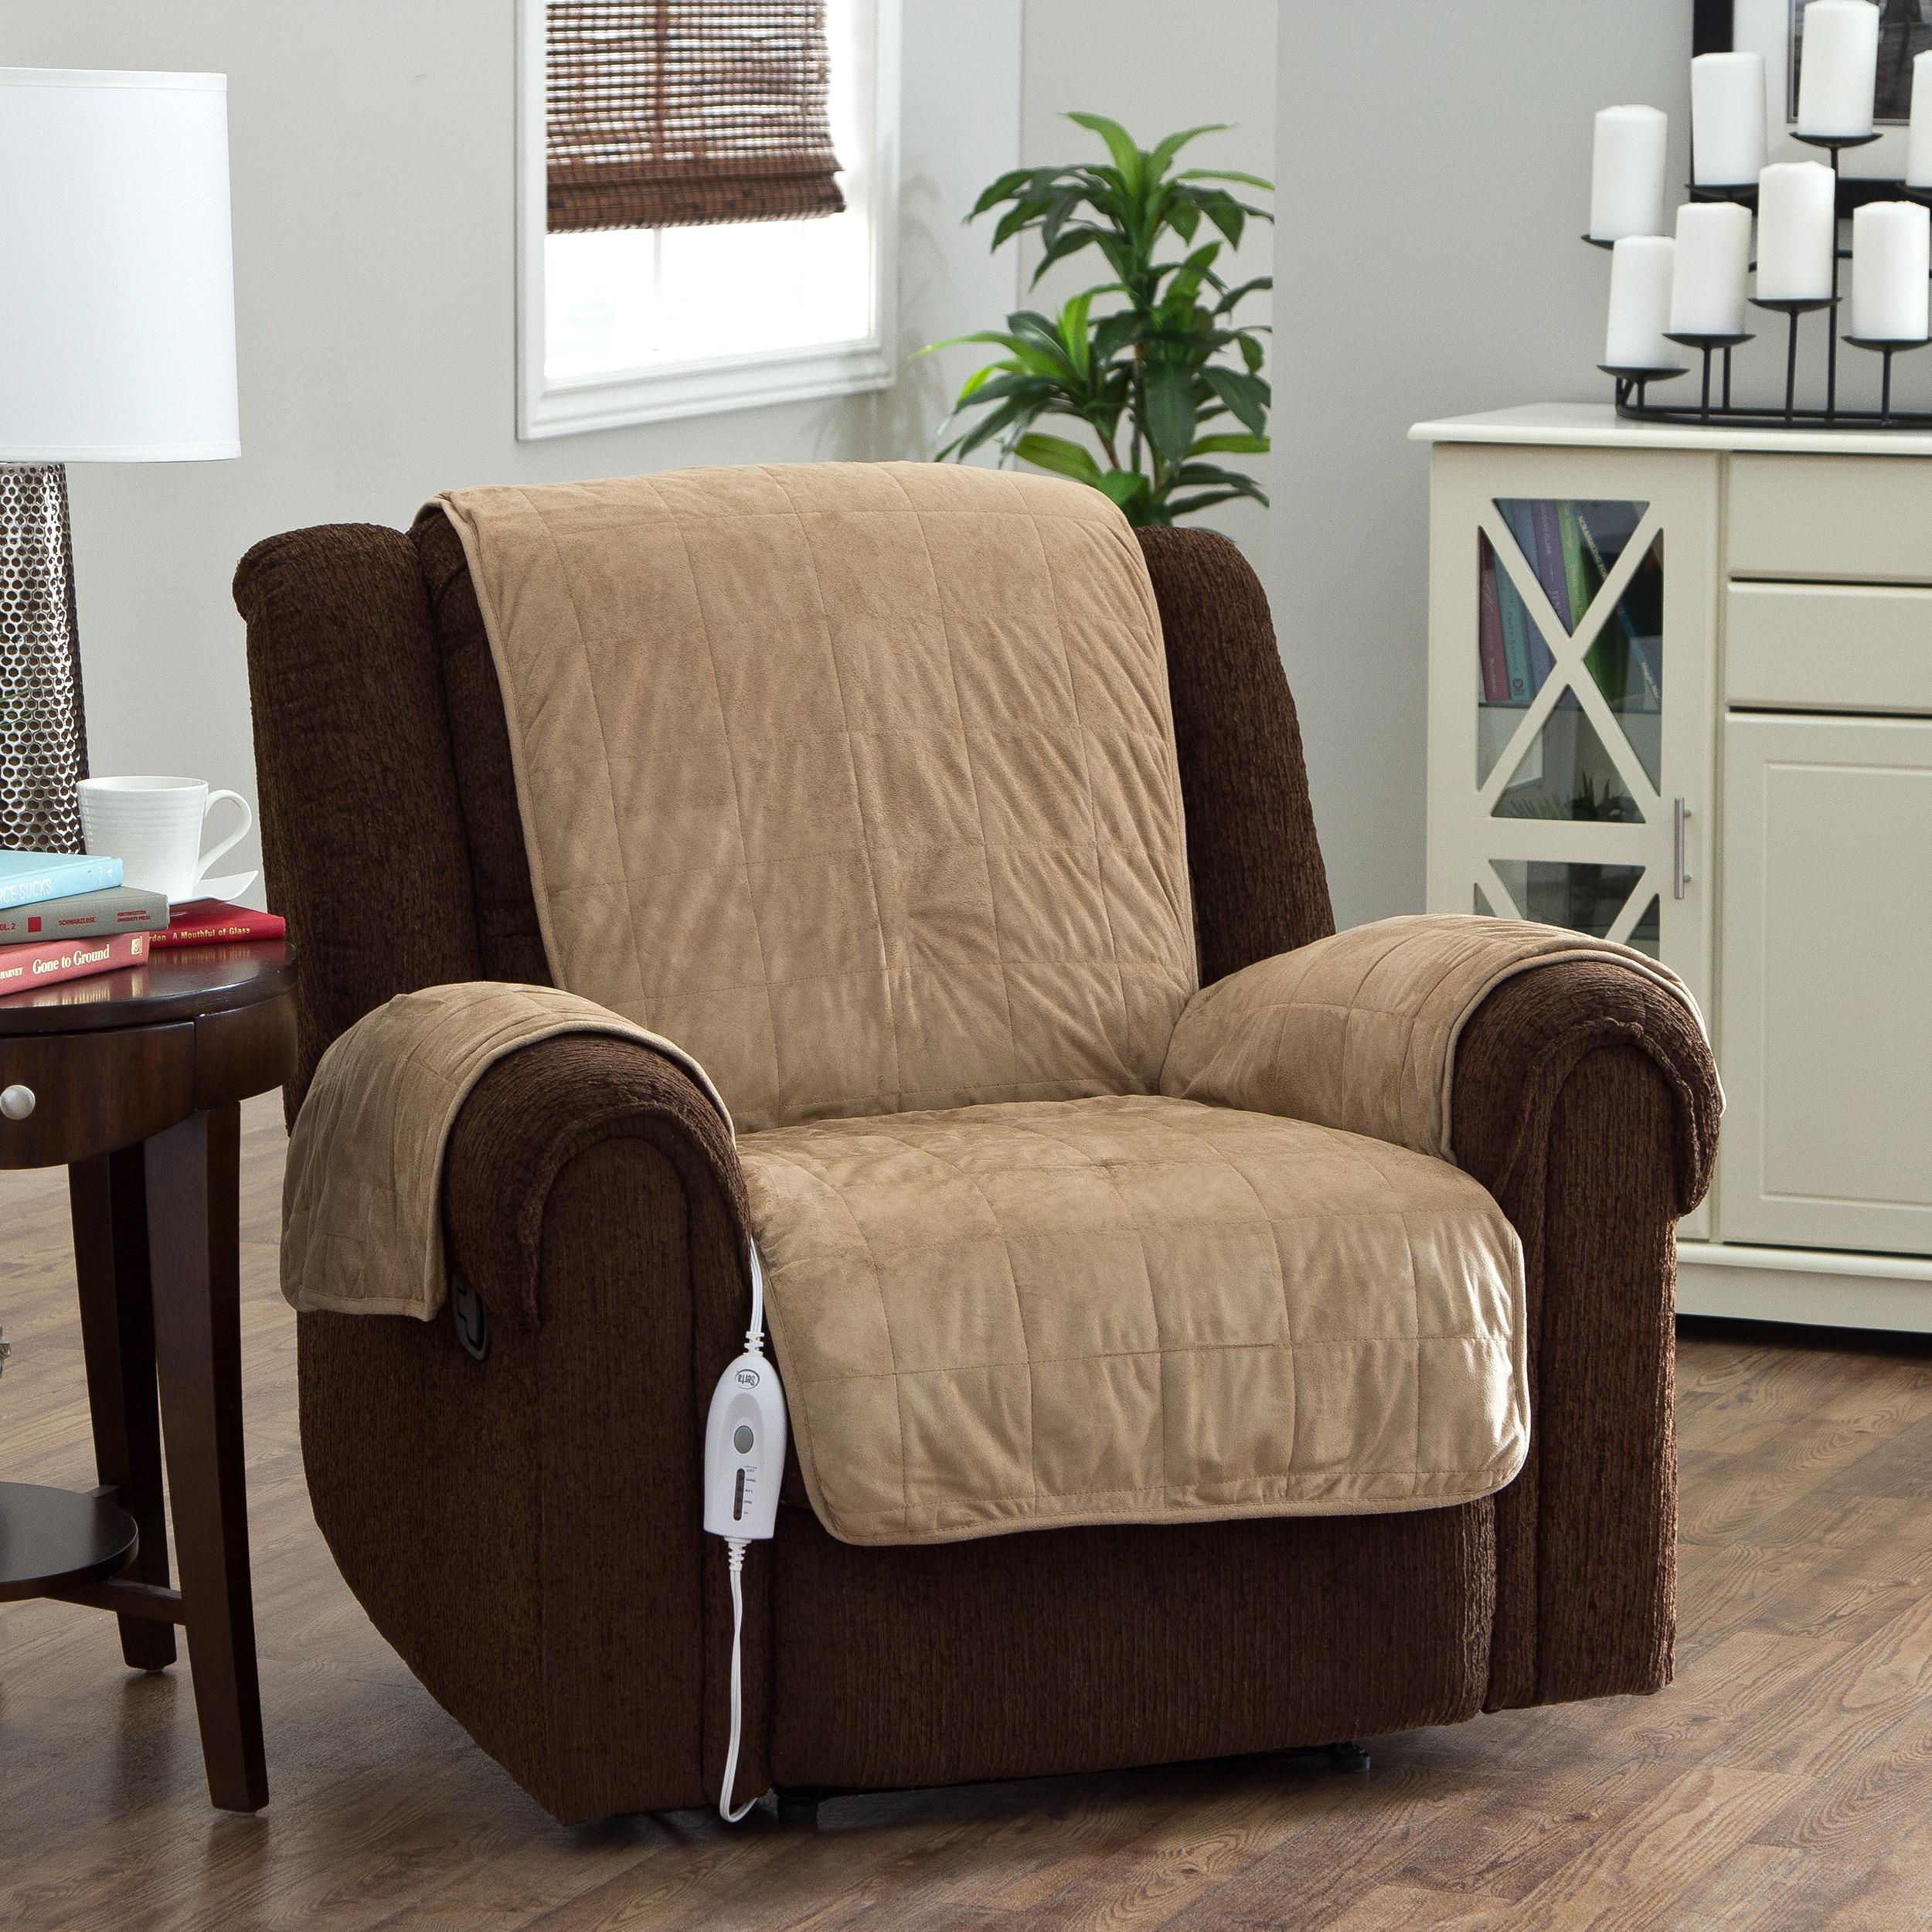 amazon color lift dp factory serta dining model full wellspring flat com chair walnut perfect fusion lay recliner warranty kitchen